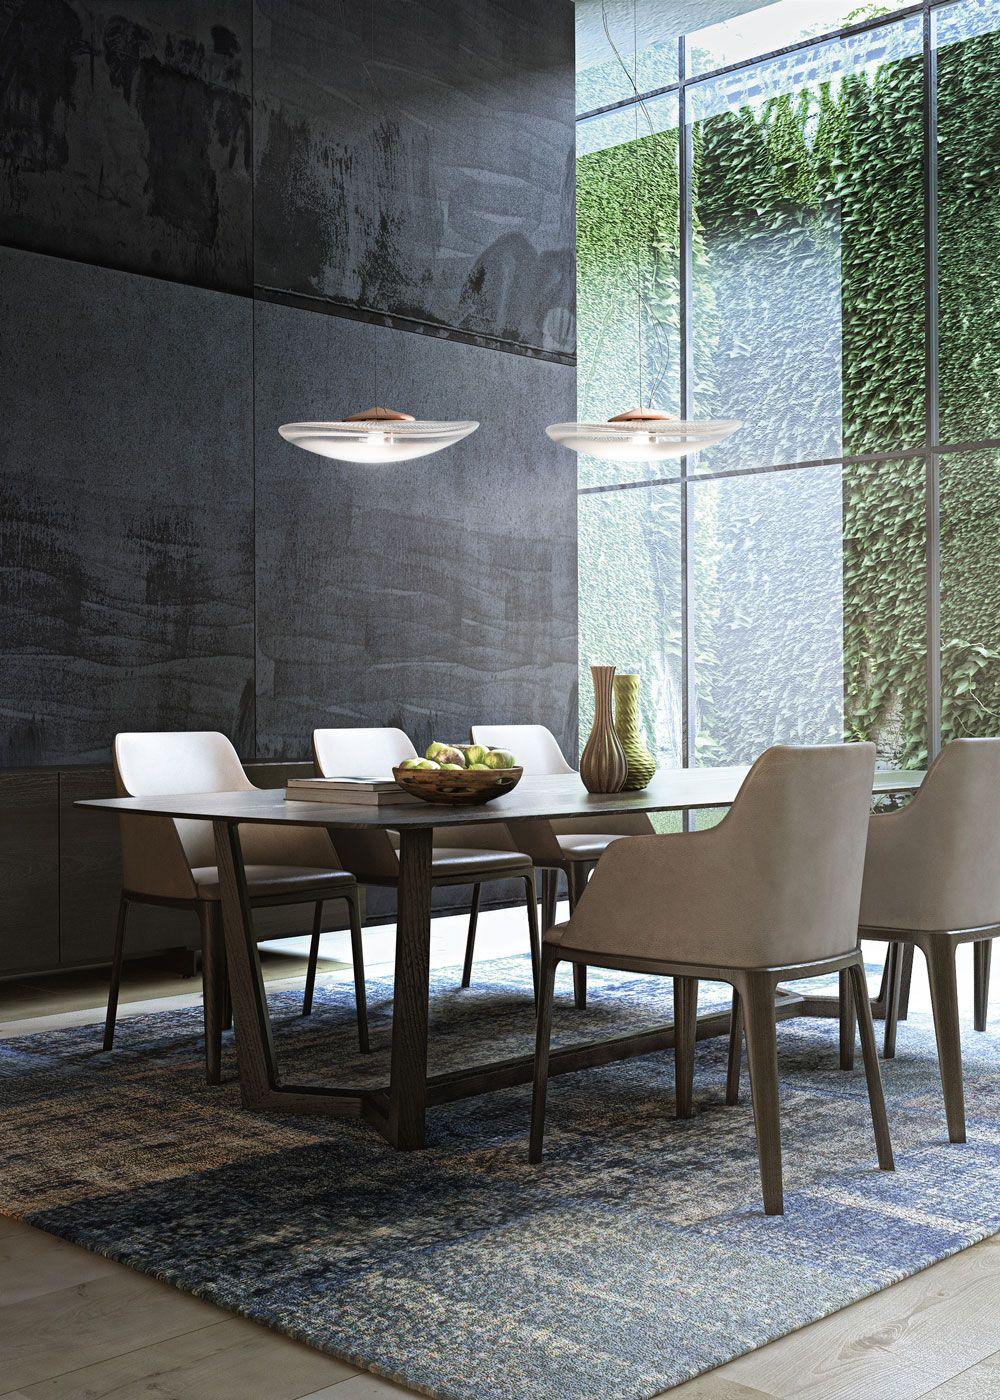 DINING ROOM IDEAS | Beautiful Dining Room, Modern Pendant |  Www.bocadolobo.com